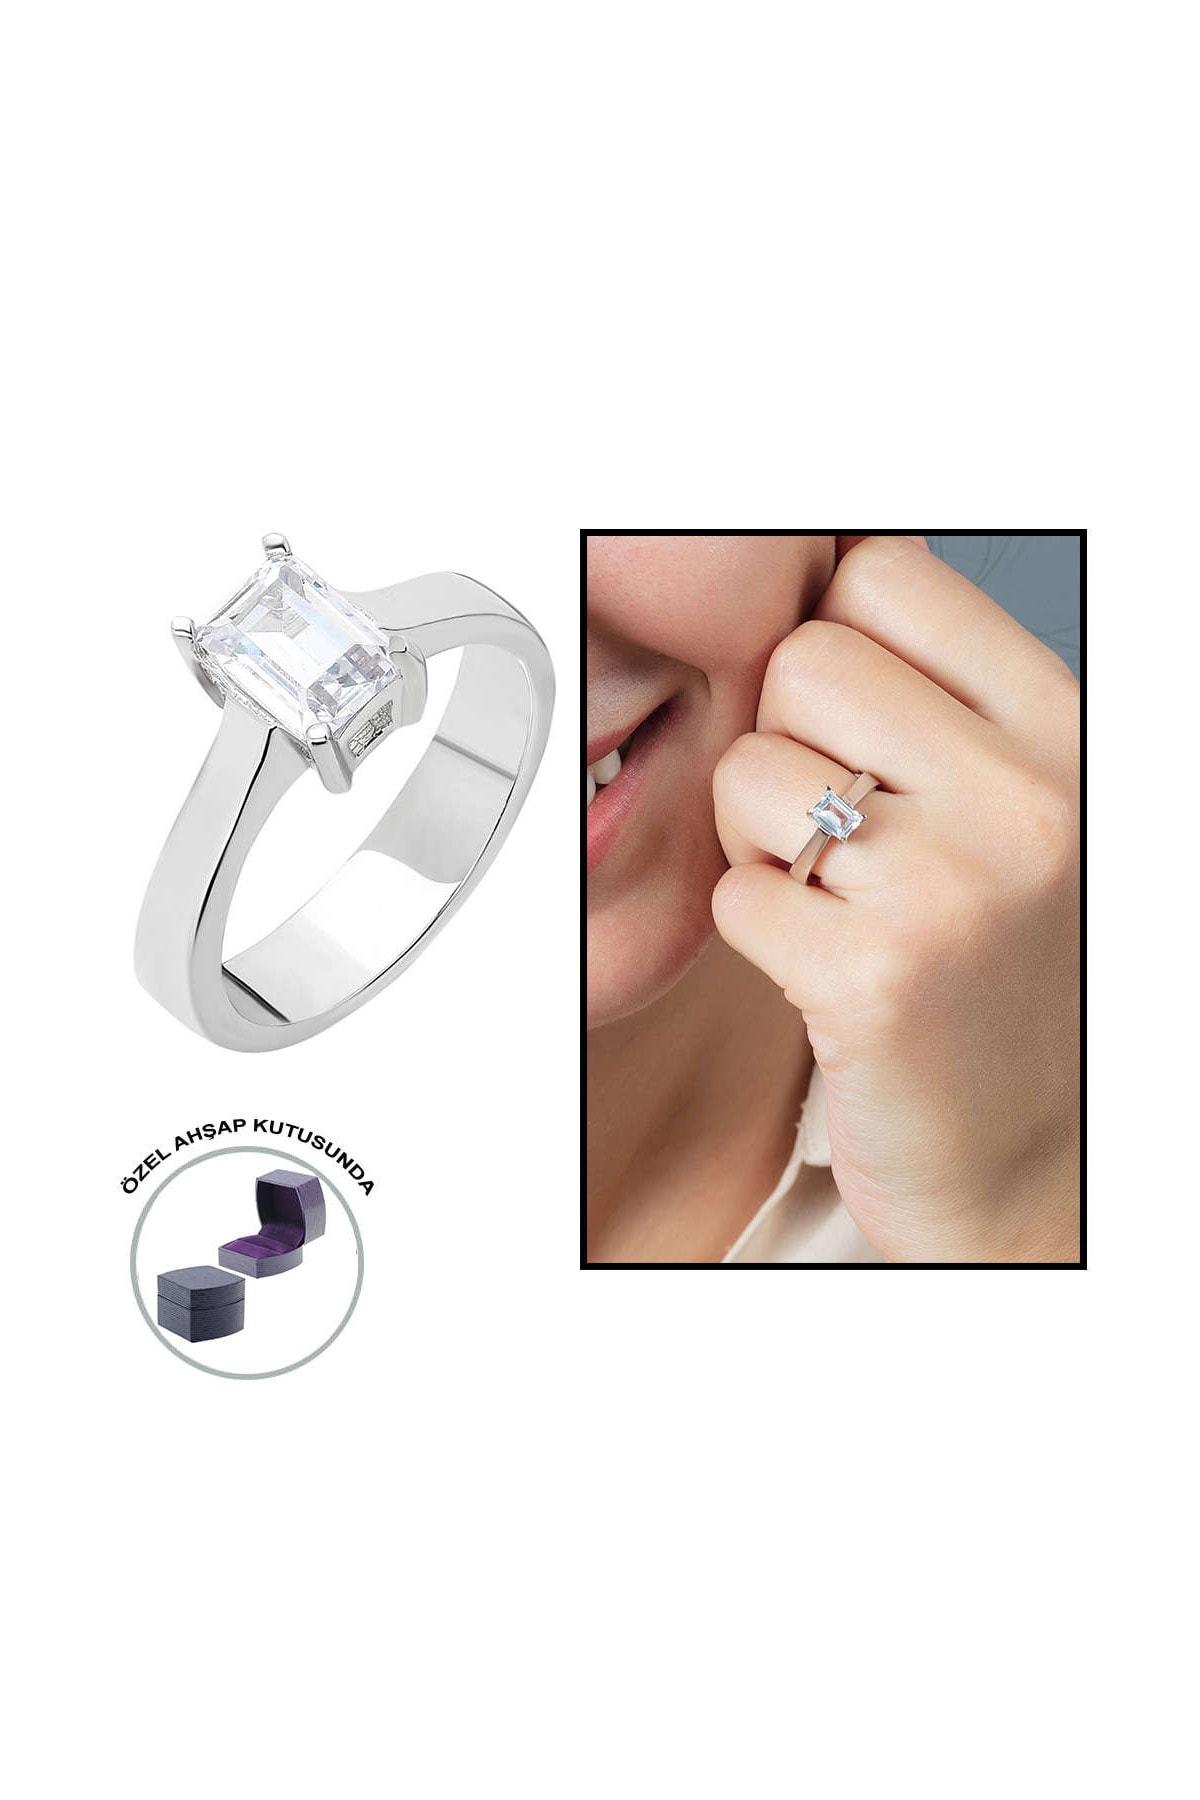 Tesbihane Starlight Diamond Pırlanta Montür Minimal Tasarım 925 Ayar Gümüş Bayan Baget Yüzük 102001792